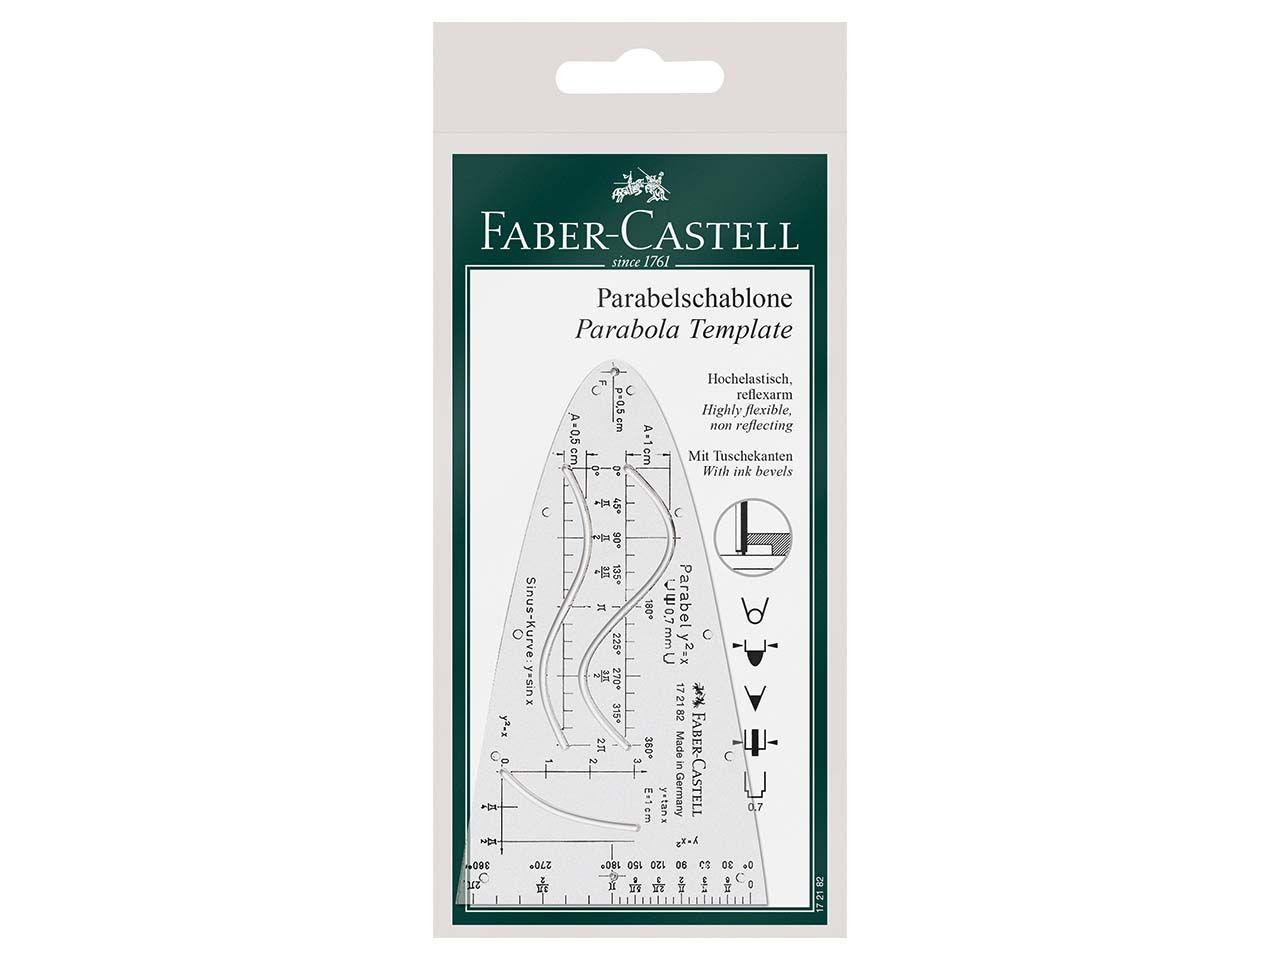 Faber-Castell Parabelschablone 172182